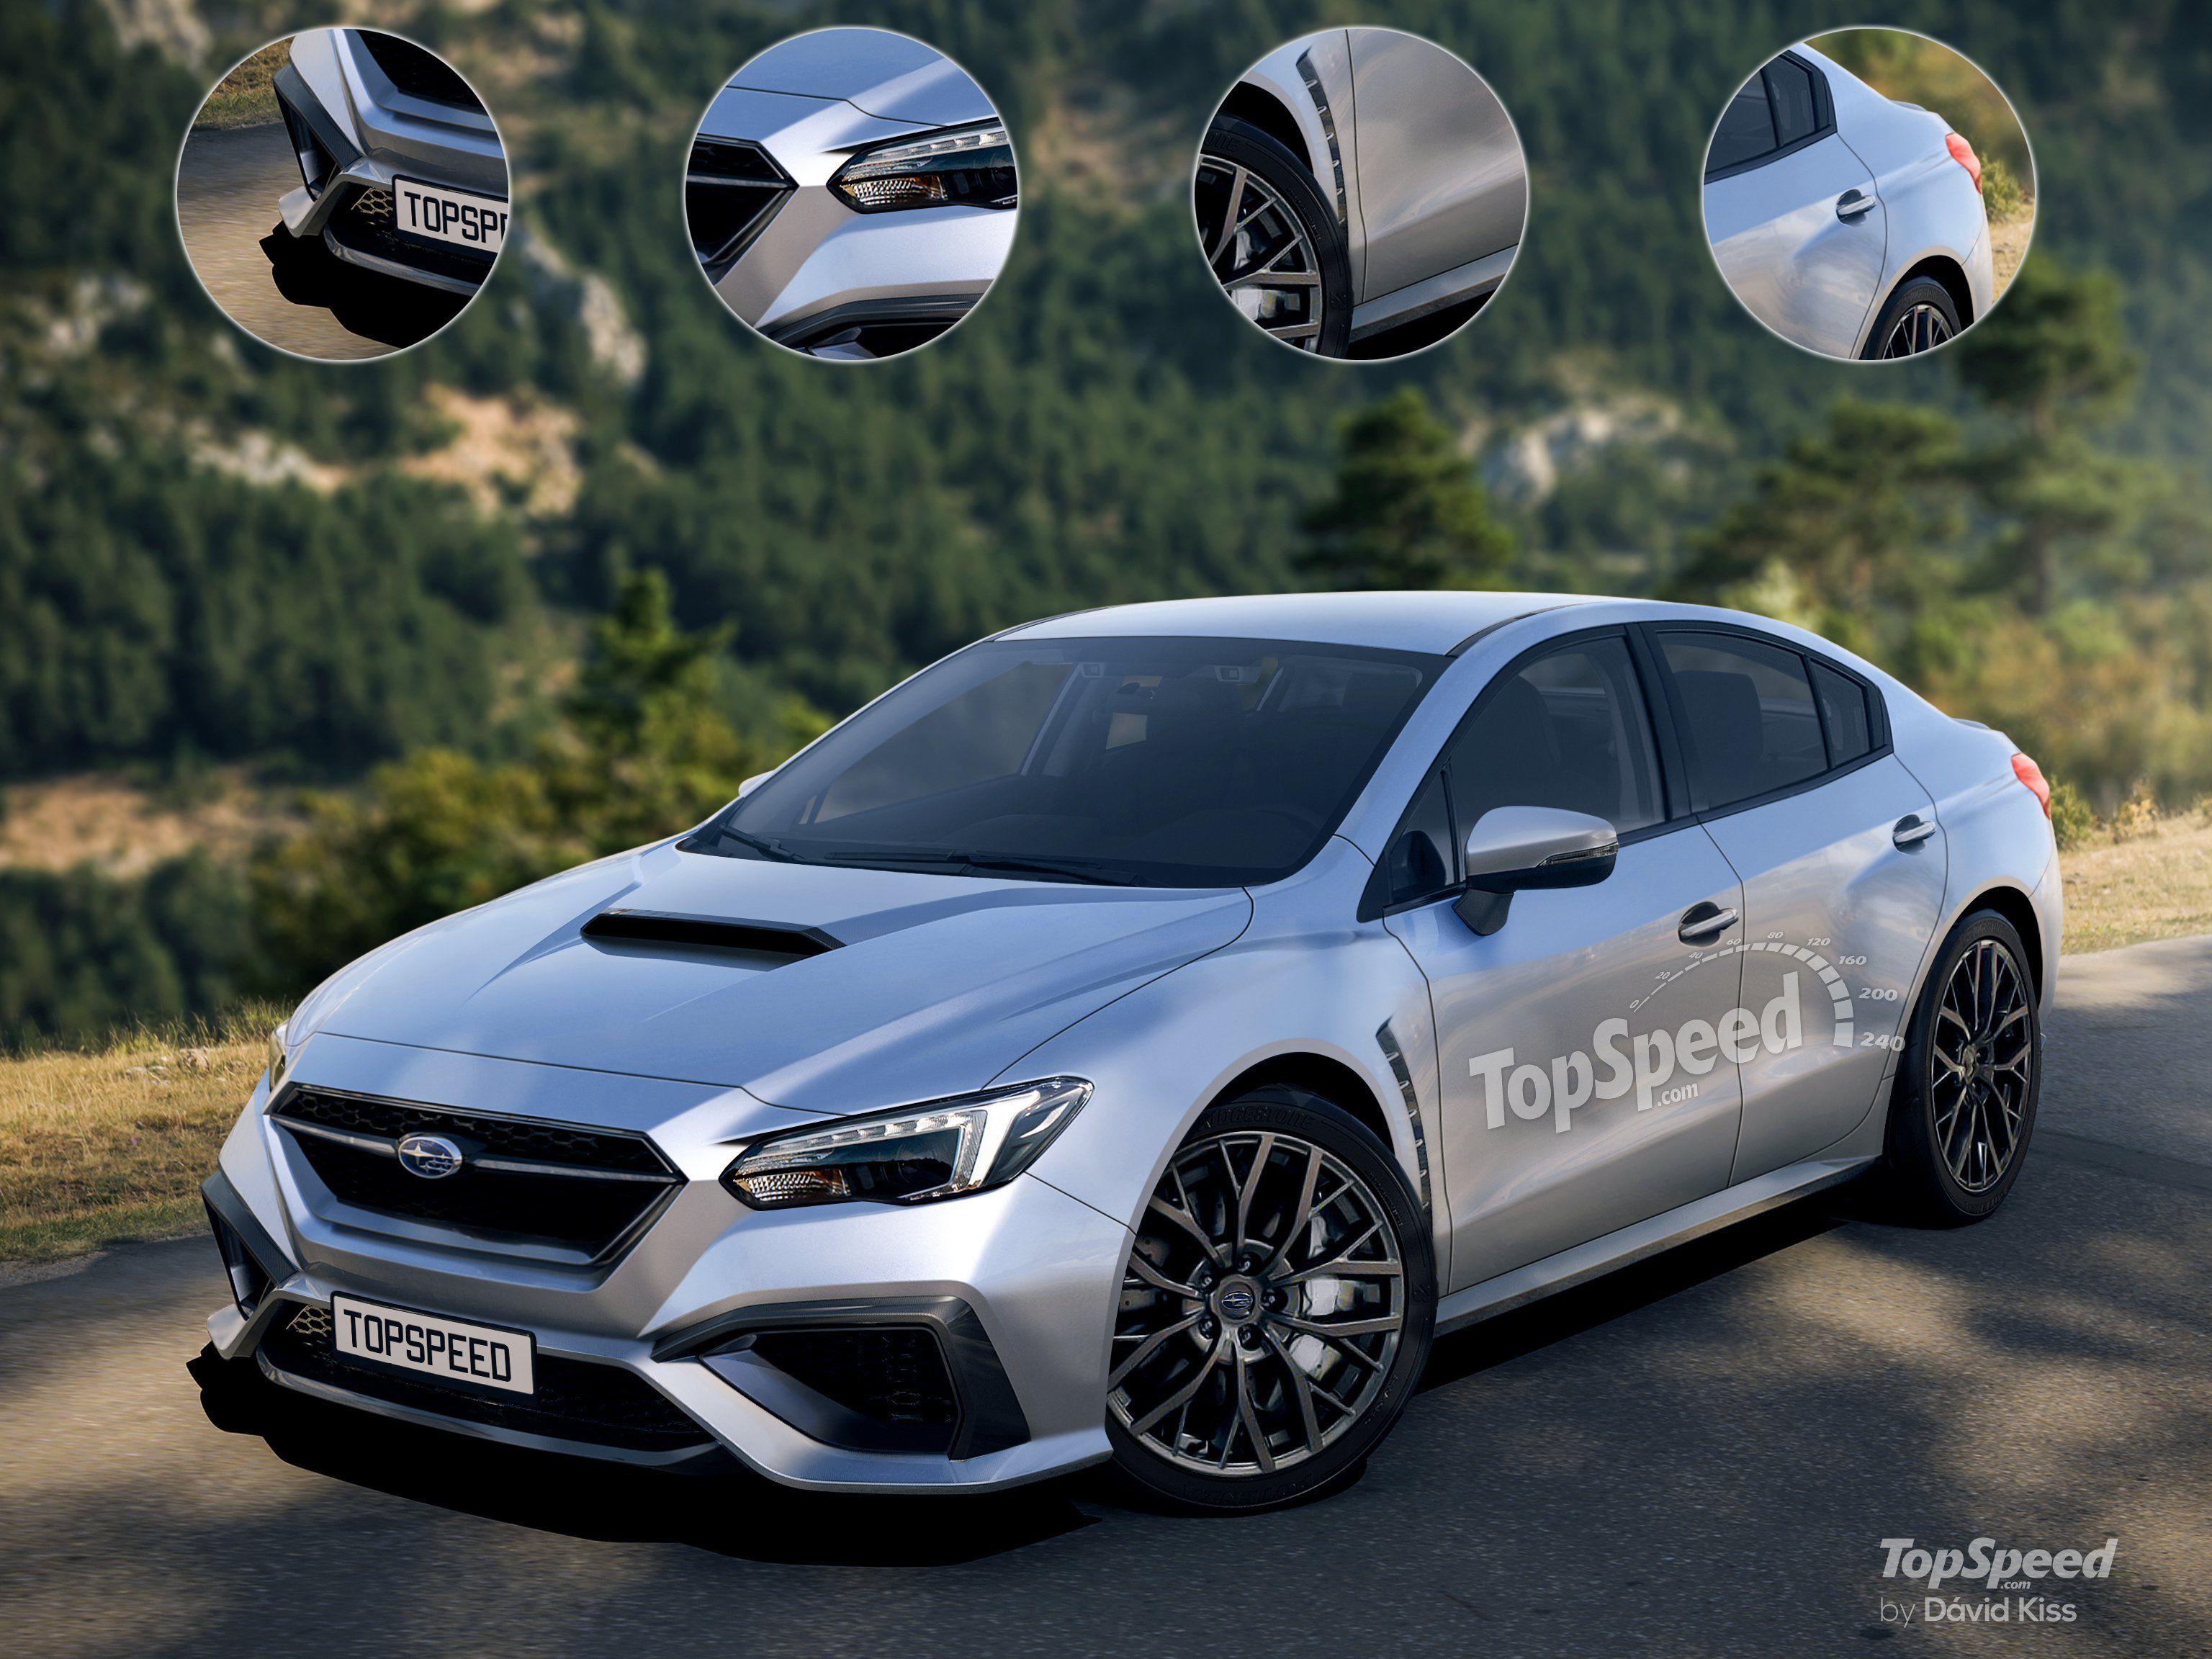 2020 Subaru Hatchback Sti Concept And Review Subaru Wrx Subaru Hatchback Wrx